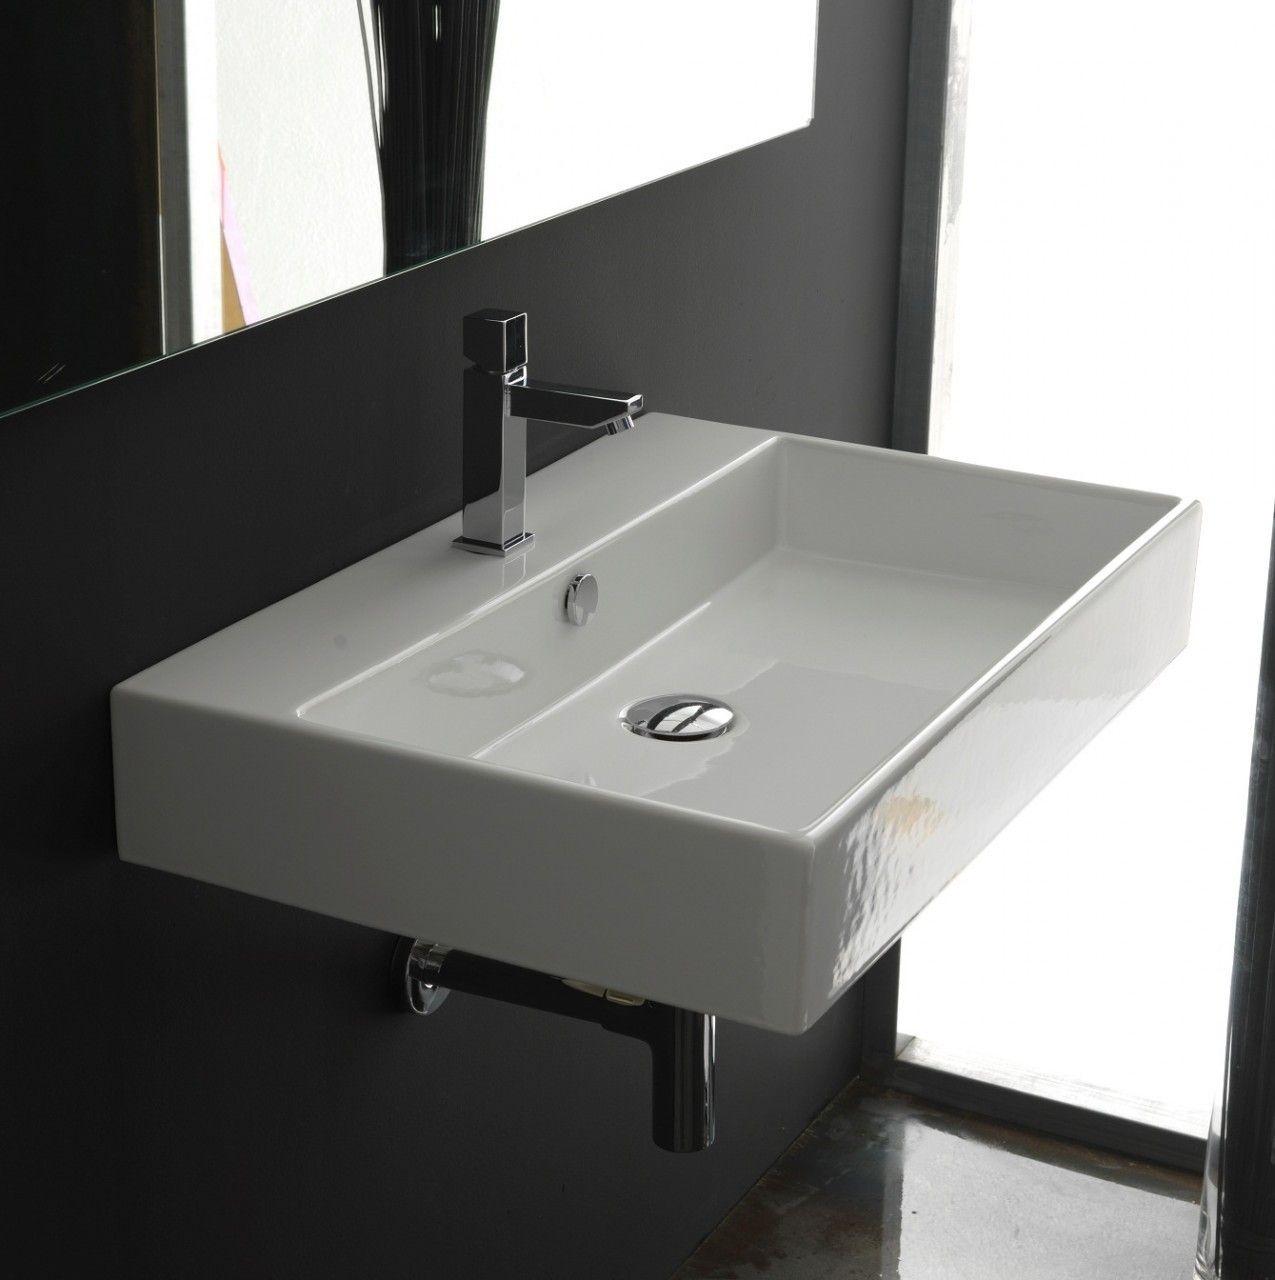 Wall mounted bathroom radio - Ws Bath Collections Unlimited 60 Wall Mounted Vessel Bathroom